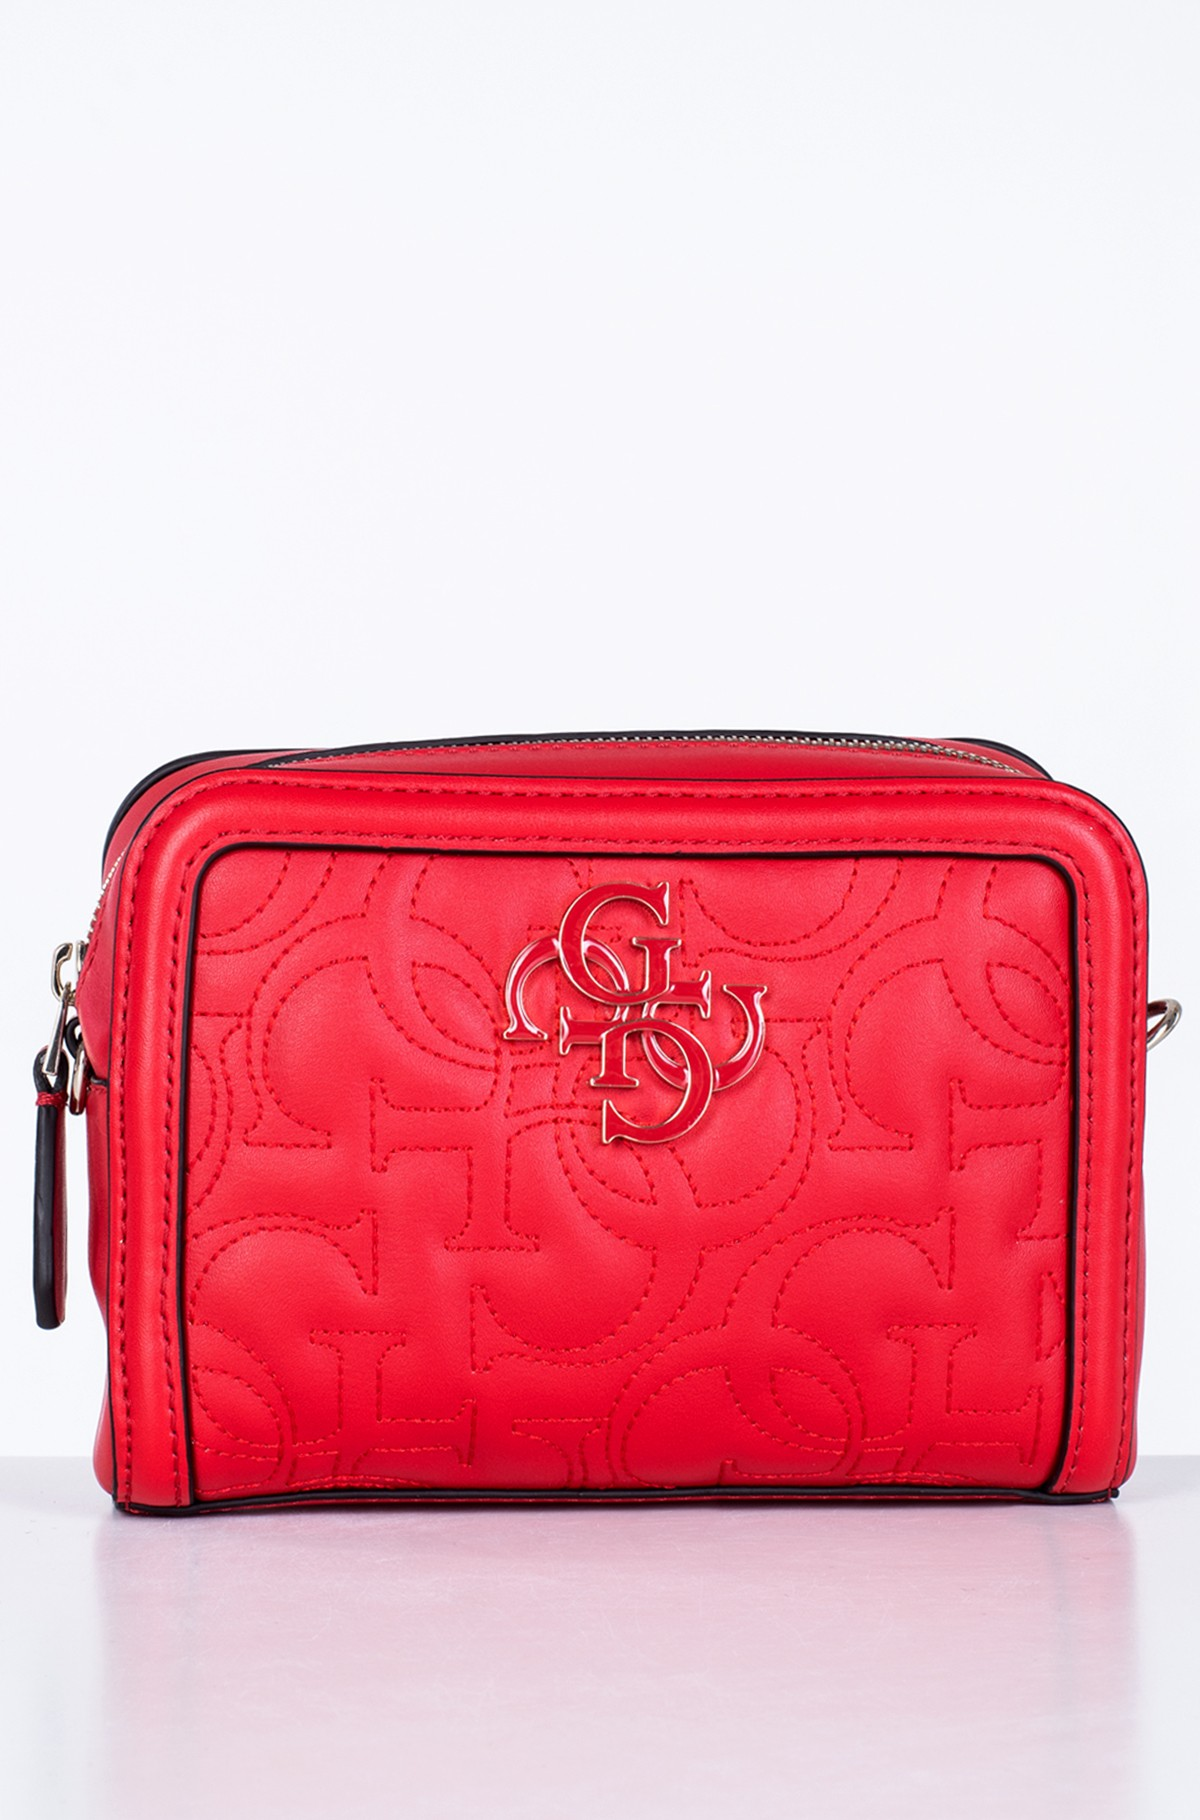 Waist bag/shoulder bag HWVG74 75810-full-1